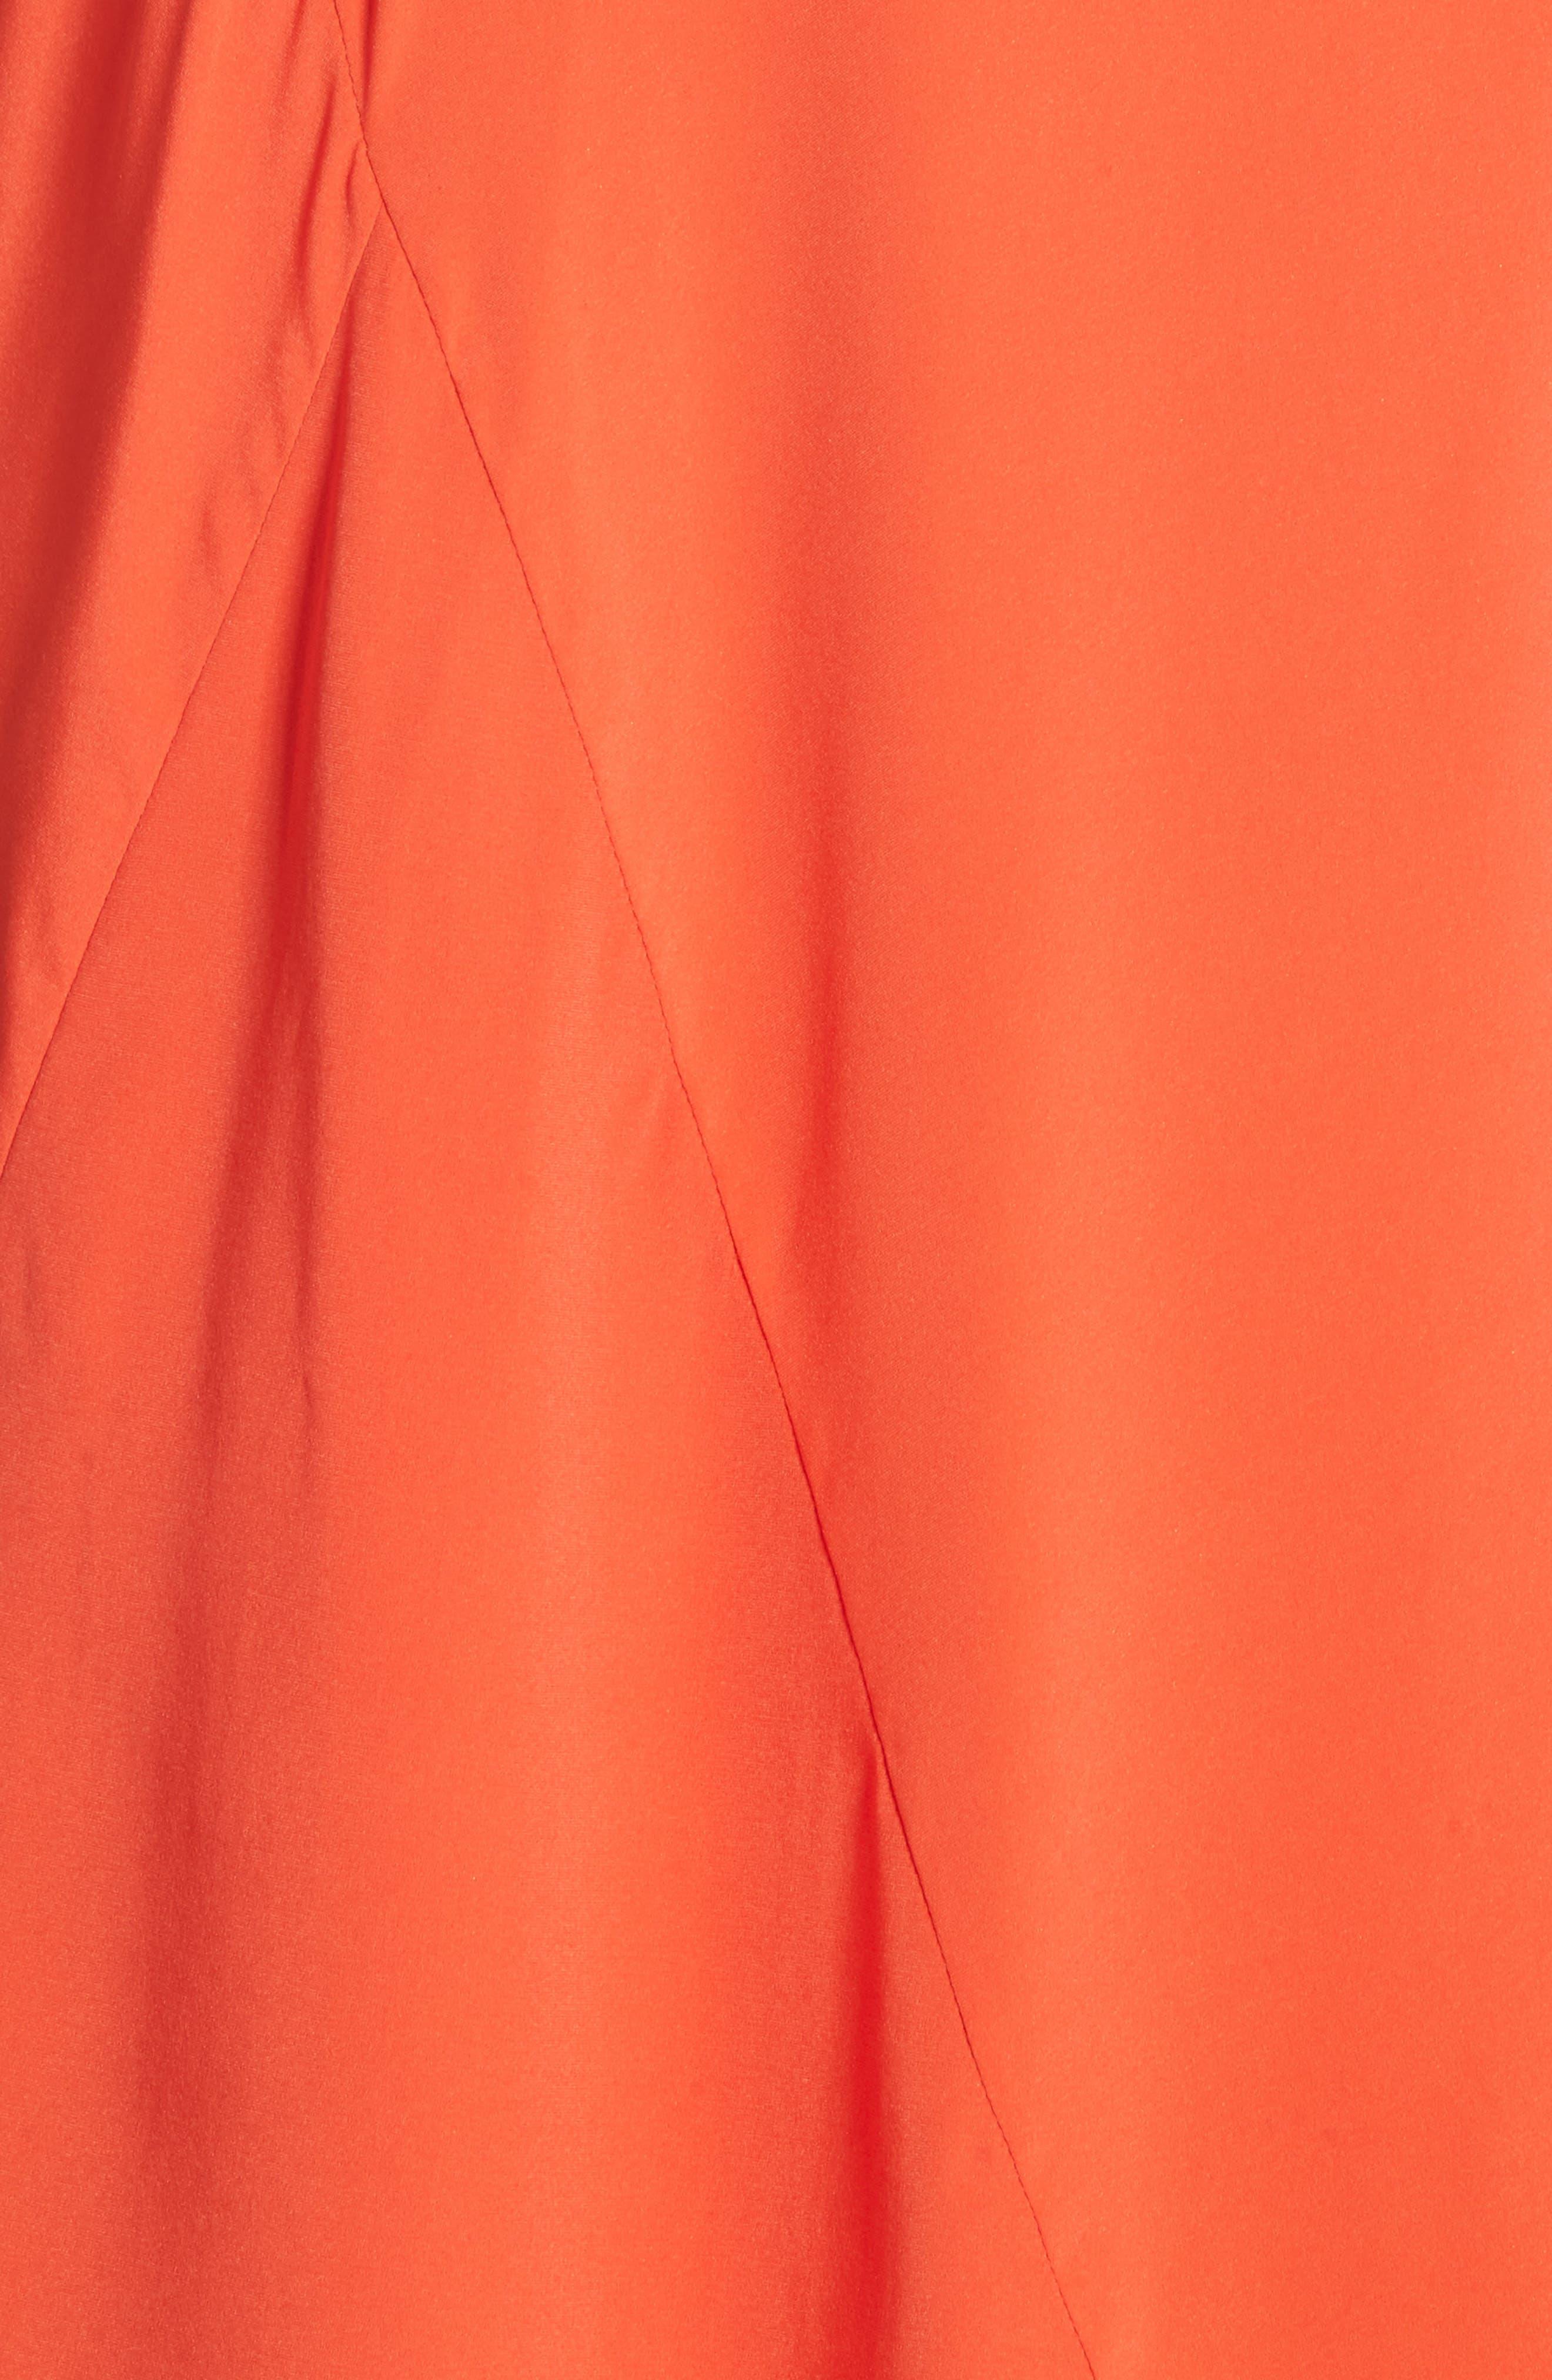 Colorblock Drape Silk Blend Dress,                             Alternate thumbnail 5, color,                             650